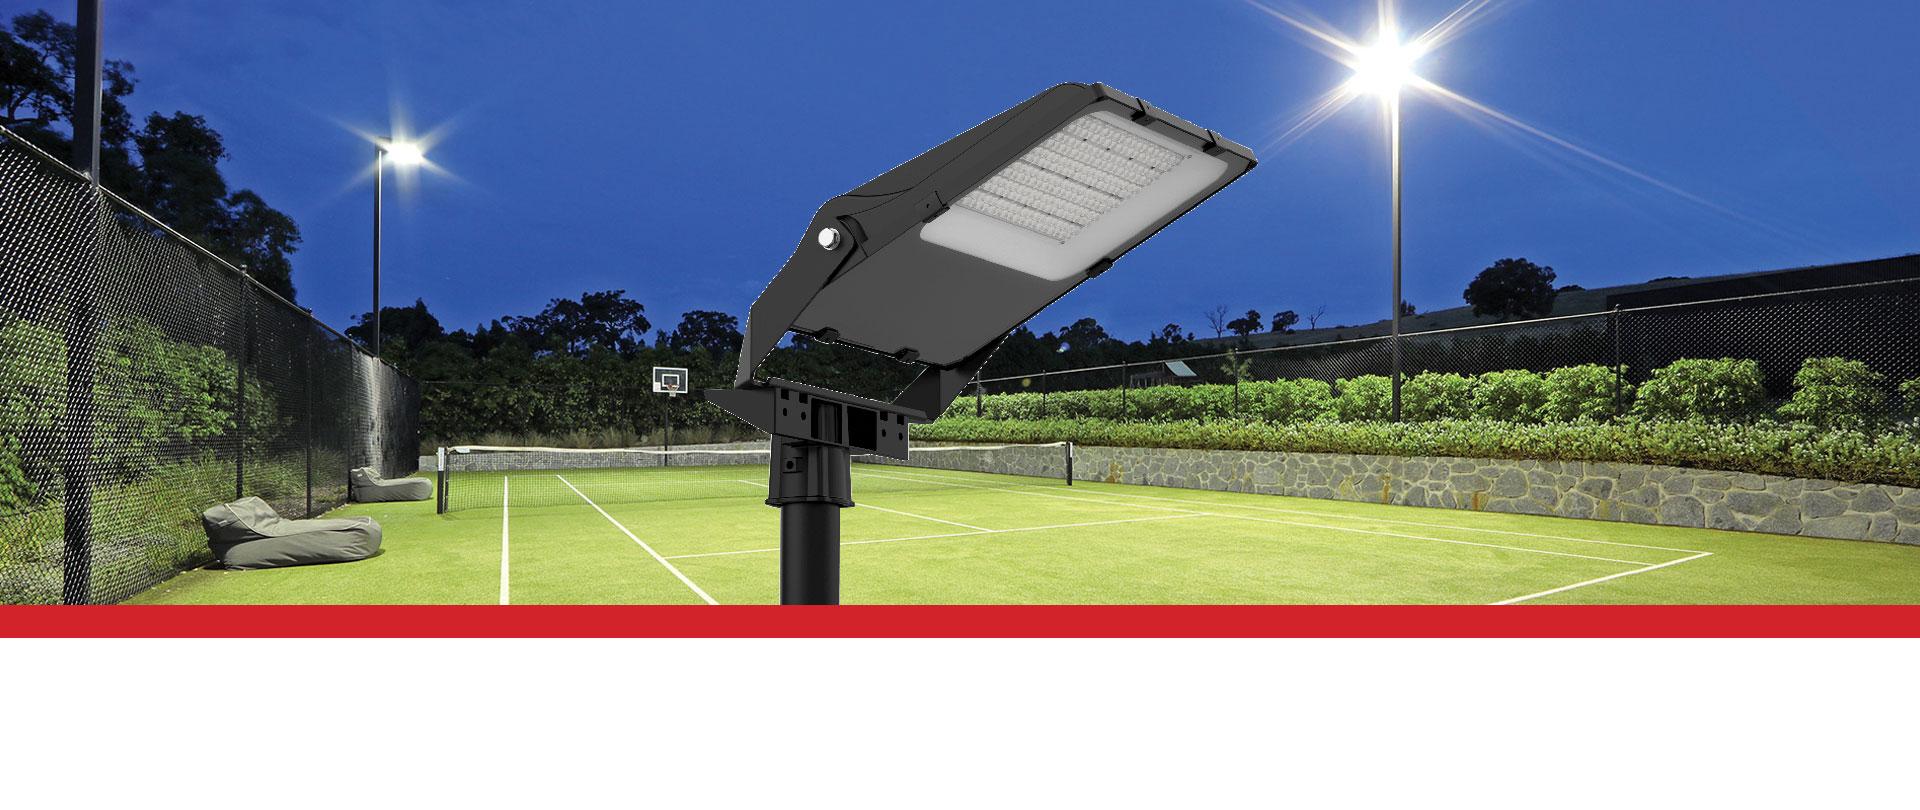 Prelux Empire Pro Sports Lighting